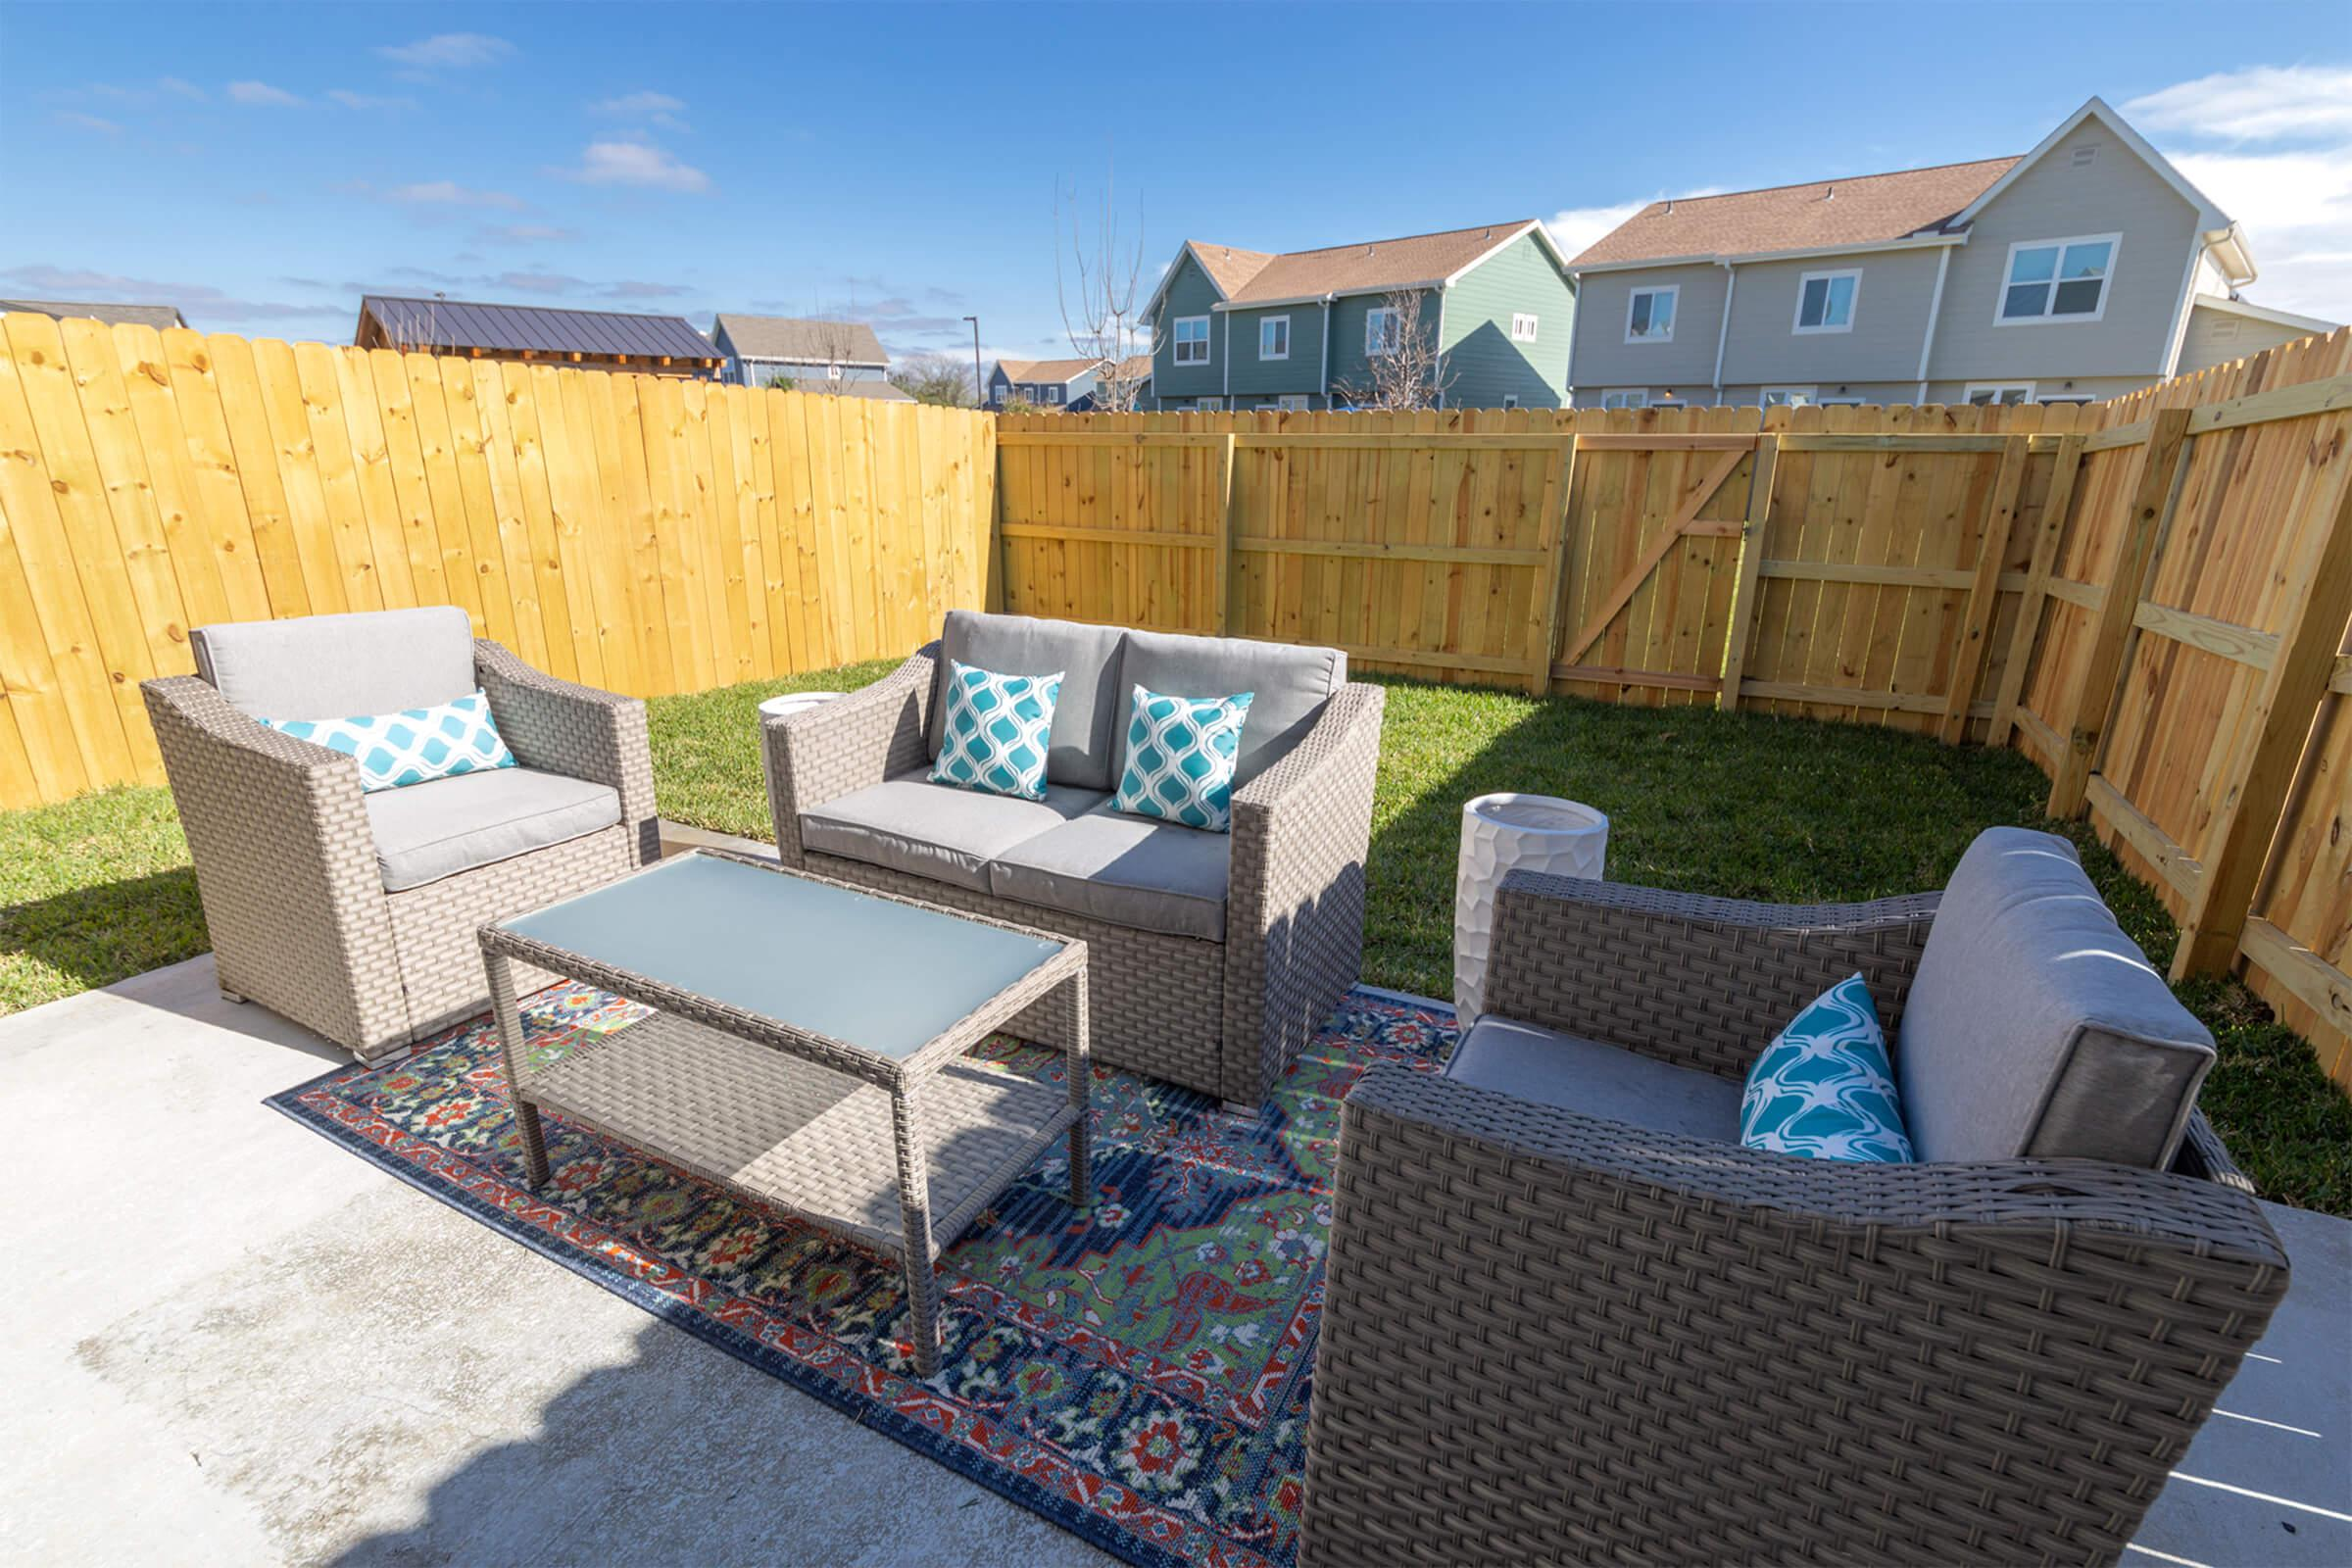 Backyard Patio Furniture.jpg